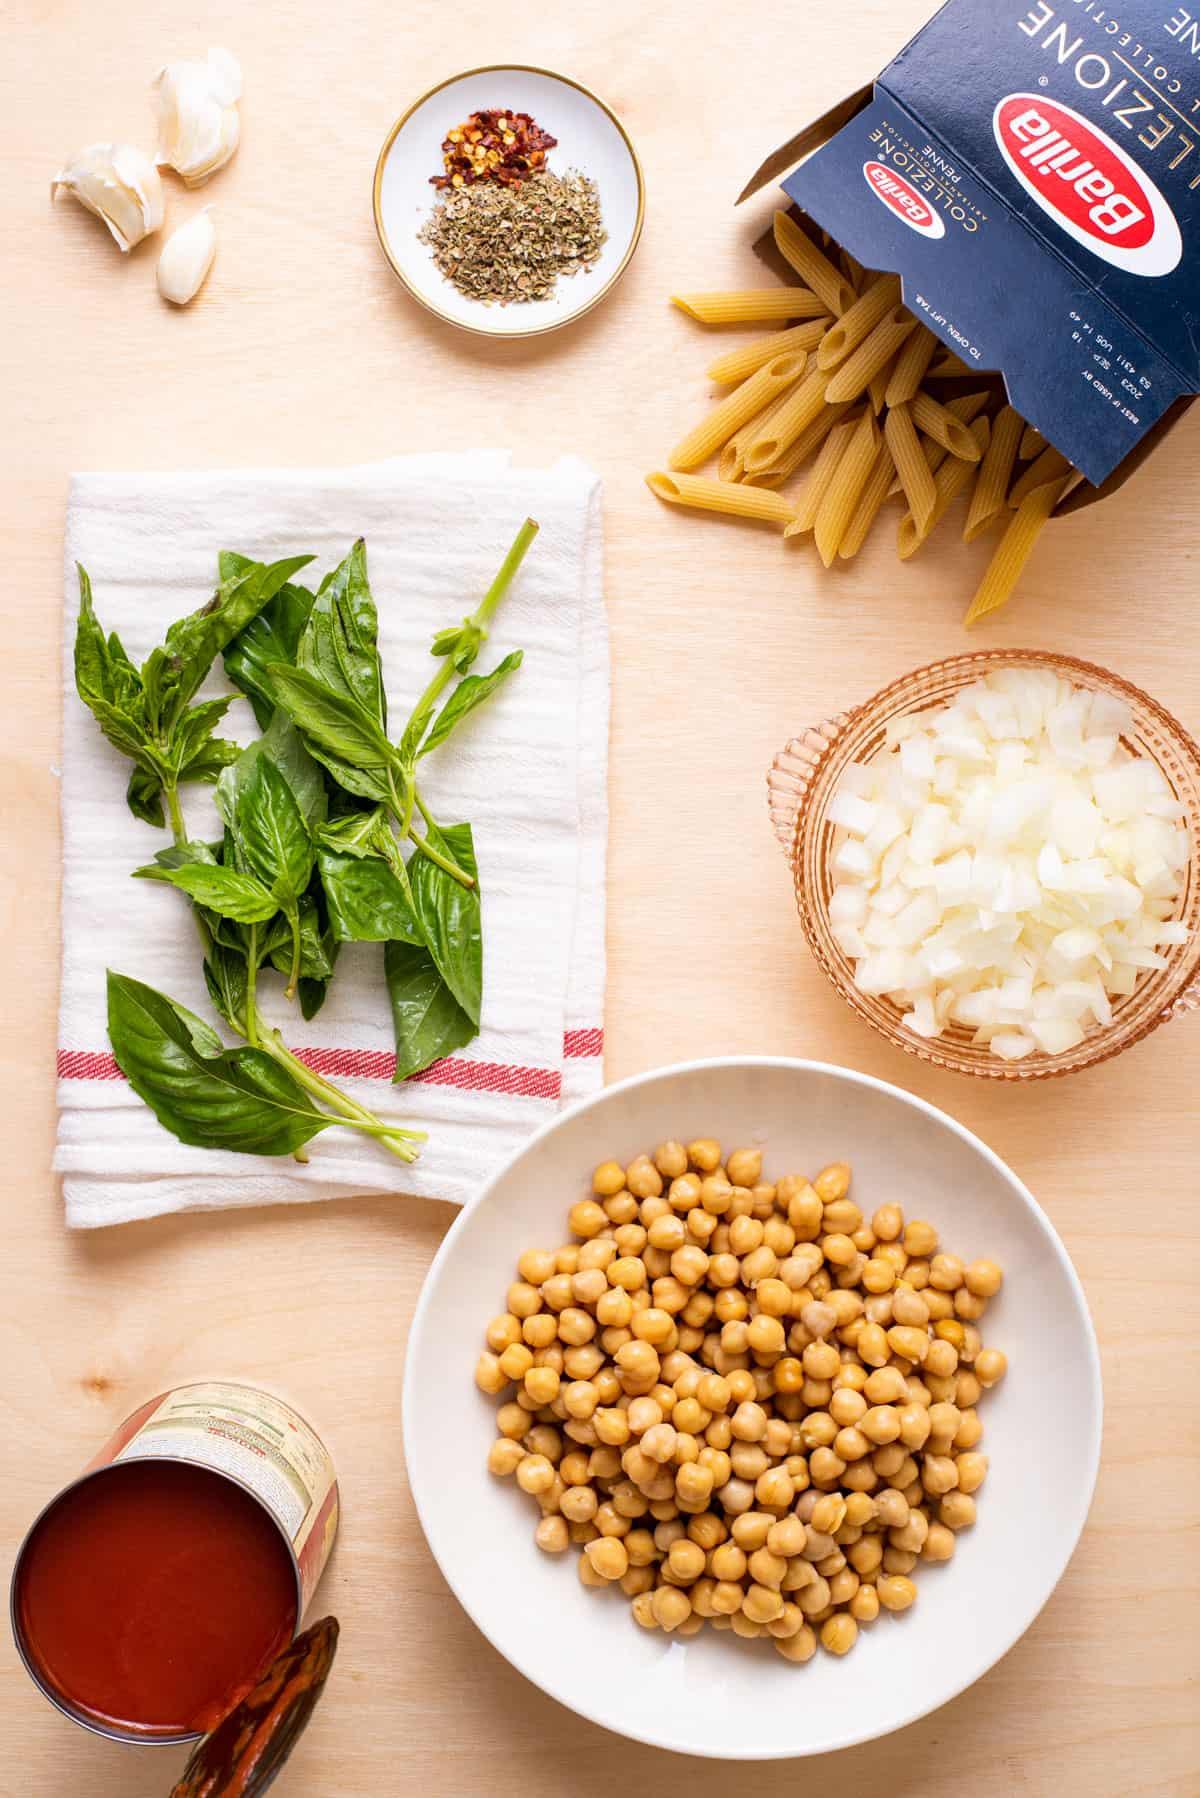 Ingredients gathered to make chickpea tomato pasta.